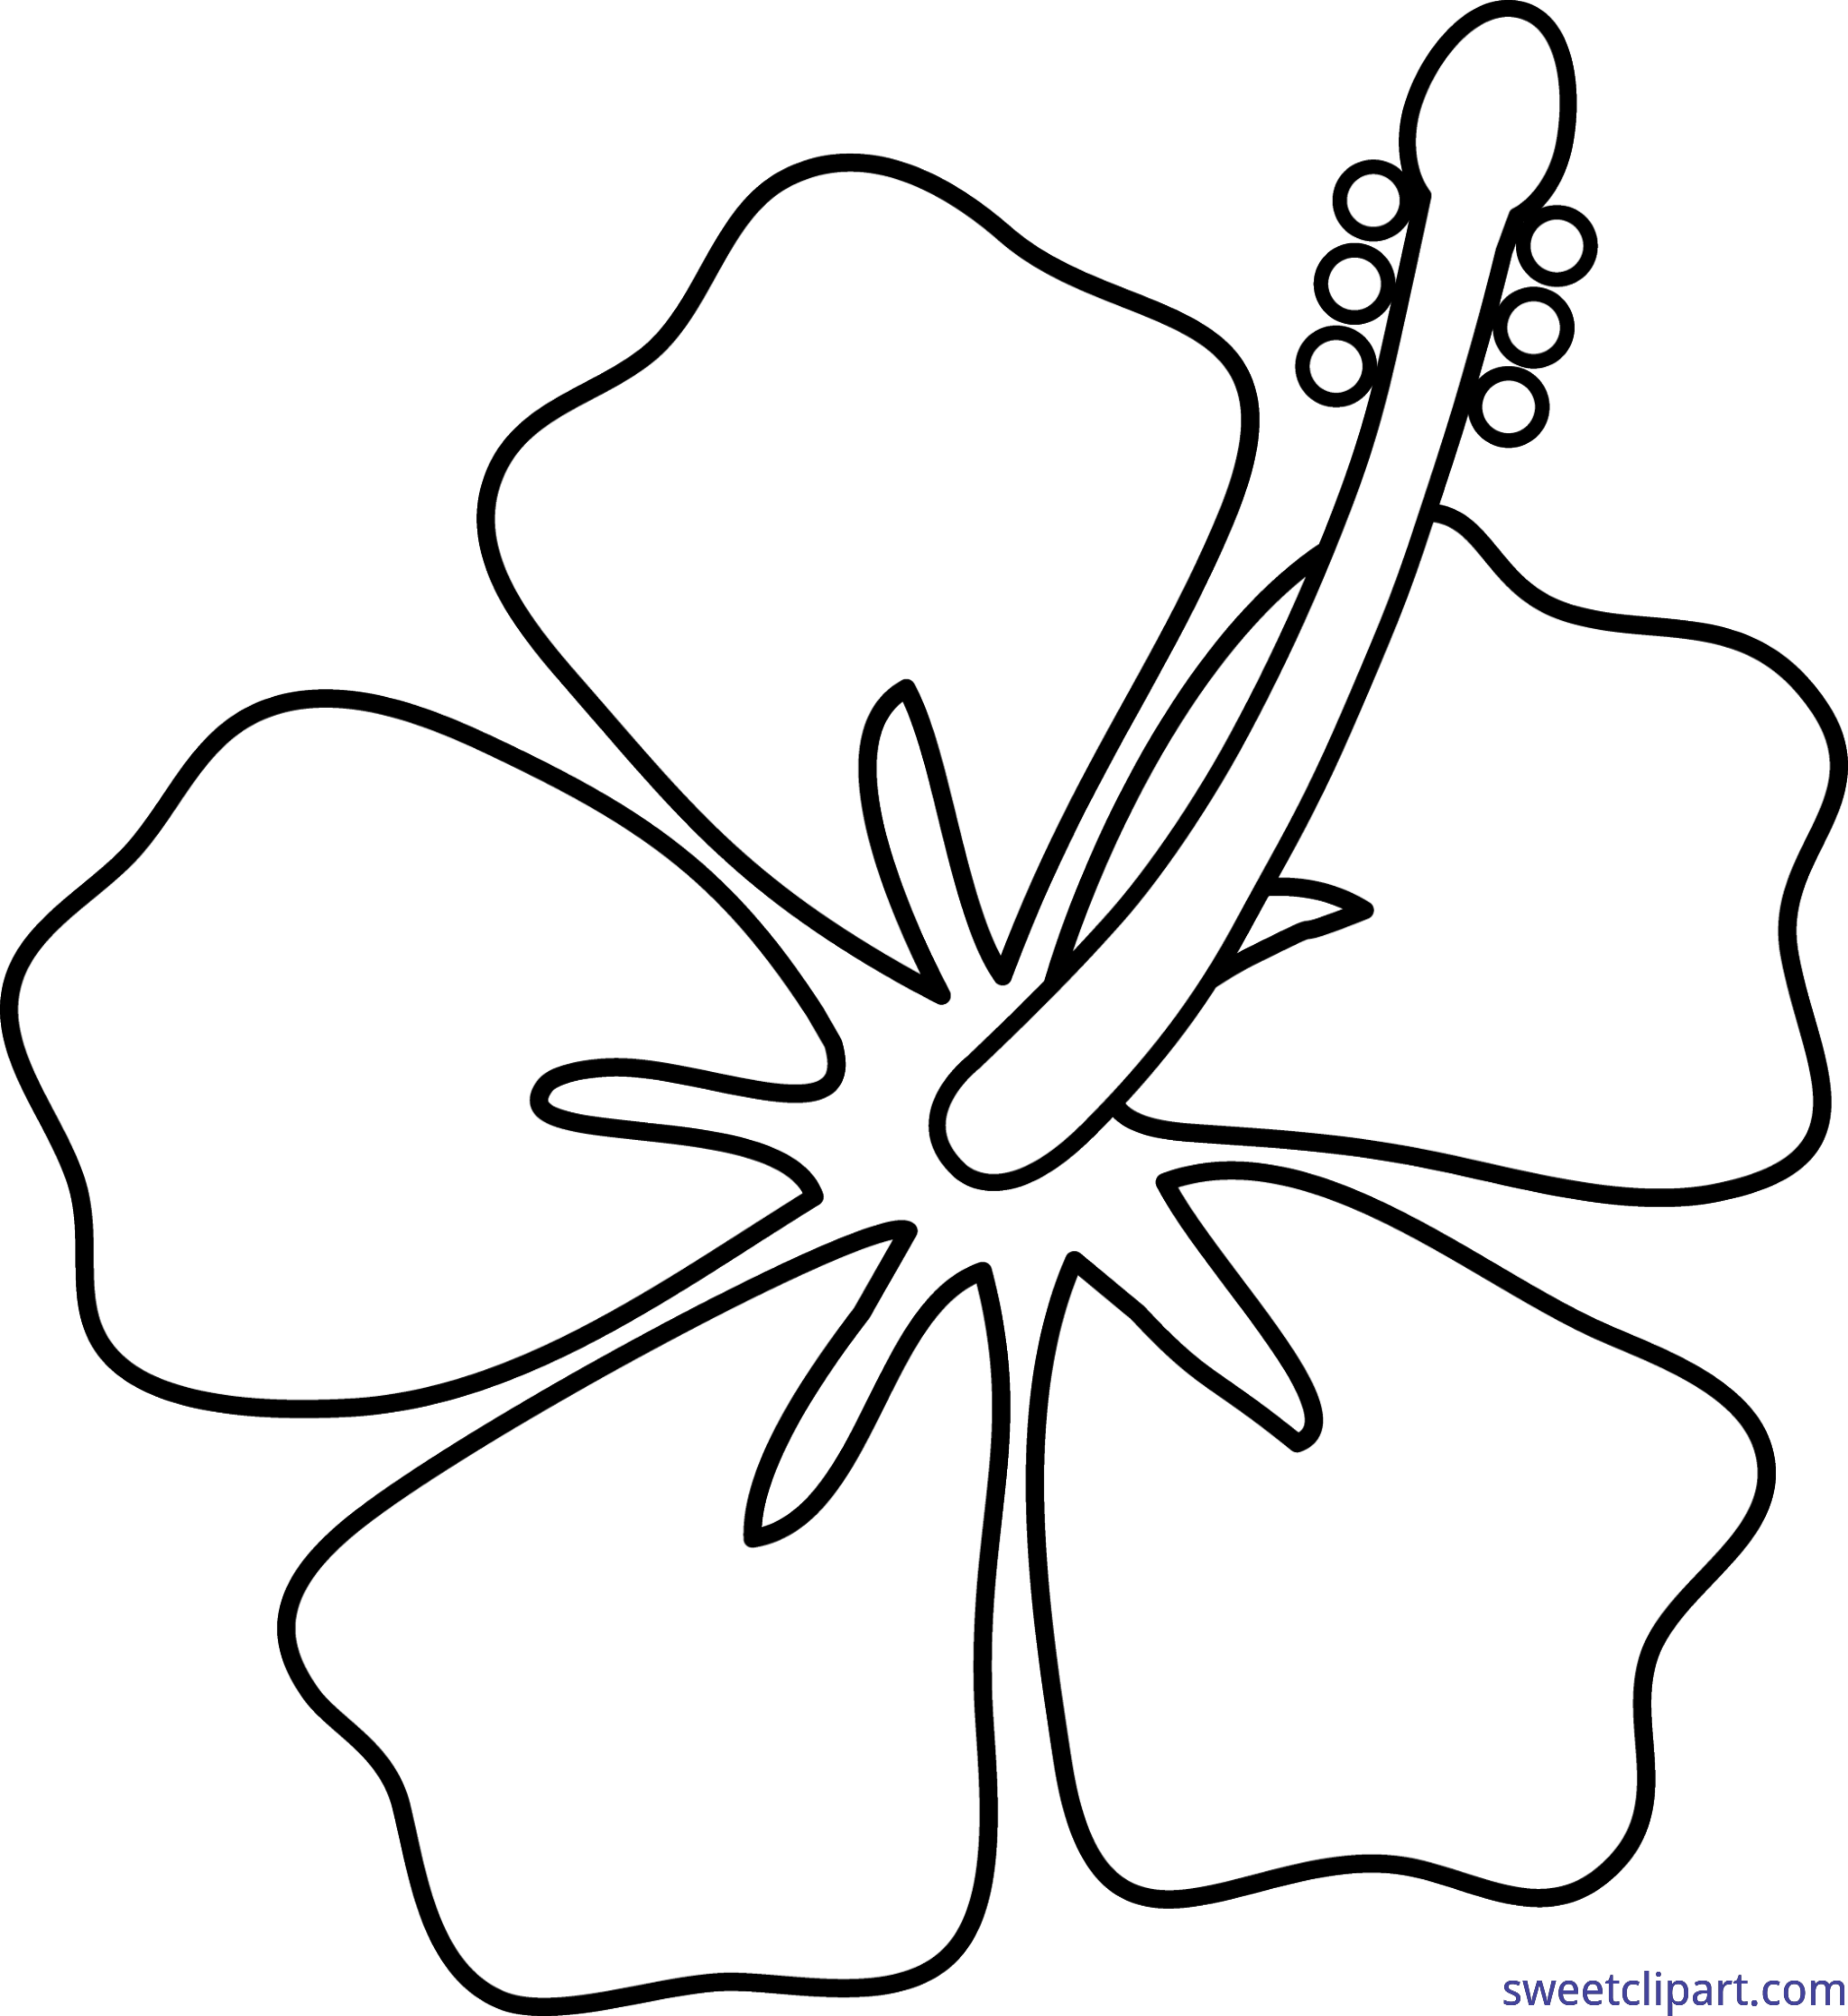 Hibiscus flower lineart clip art sweet clip art hibiscus flower lineart clip art izmirmasajfo